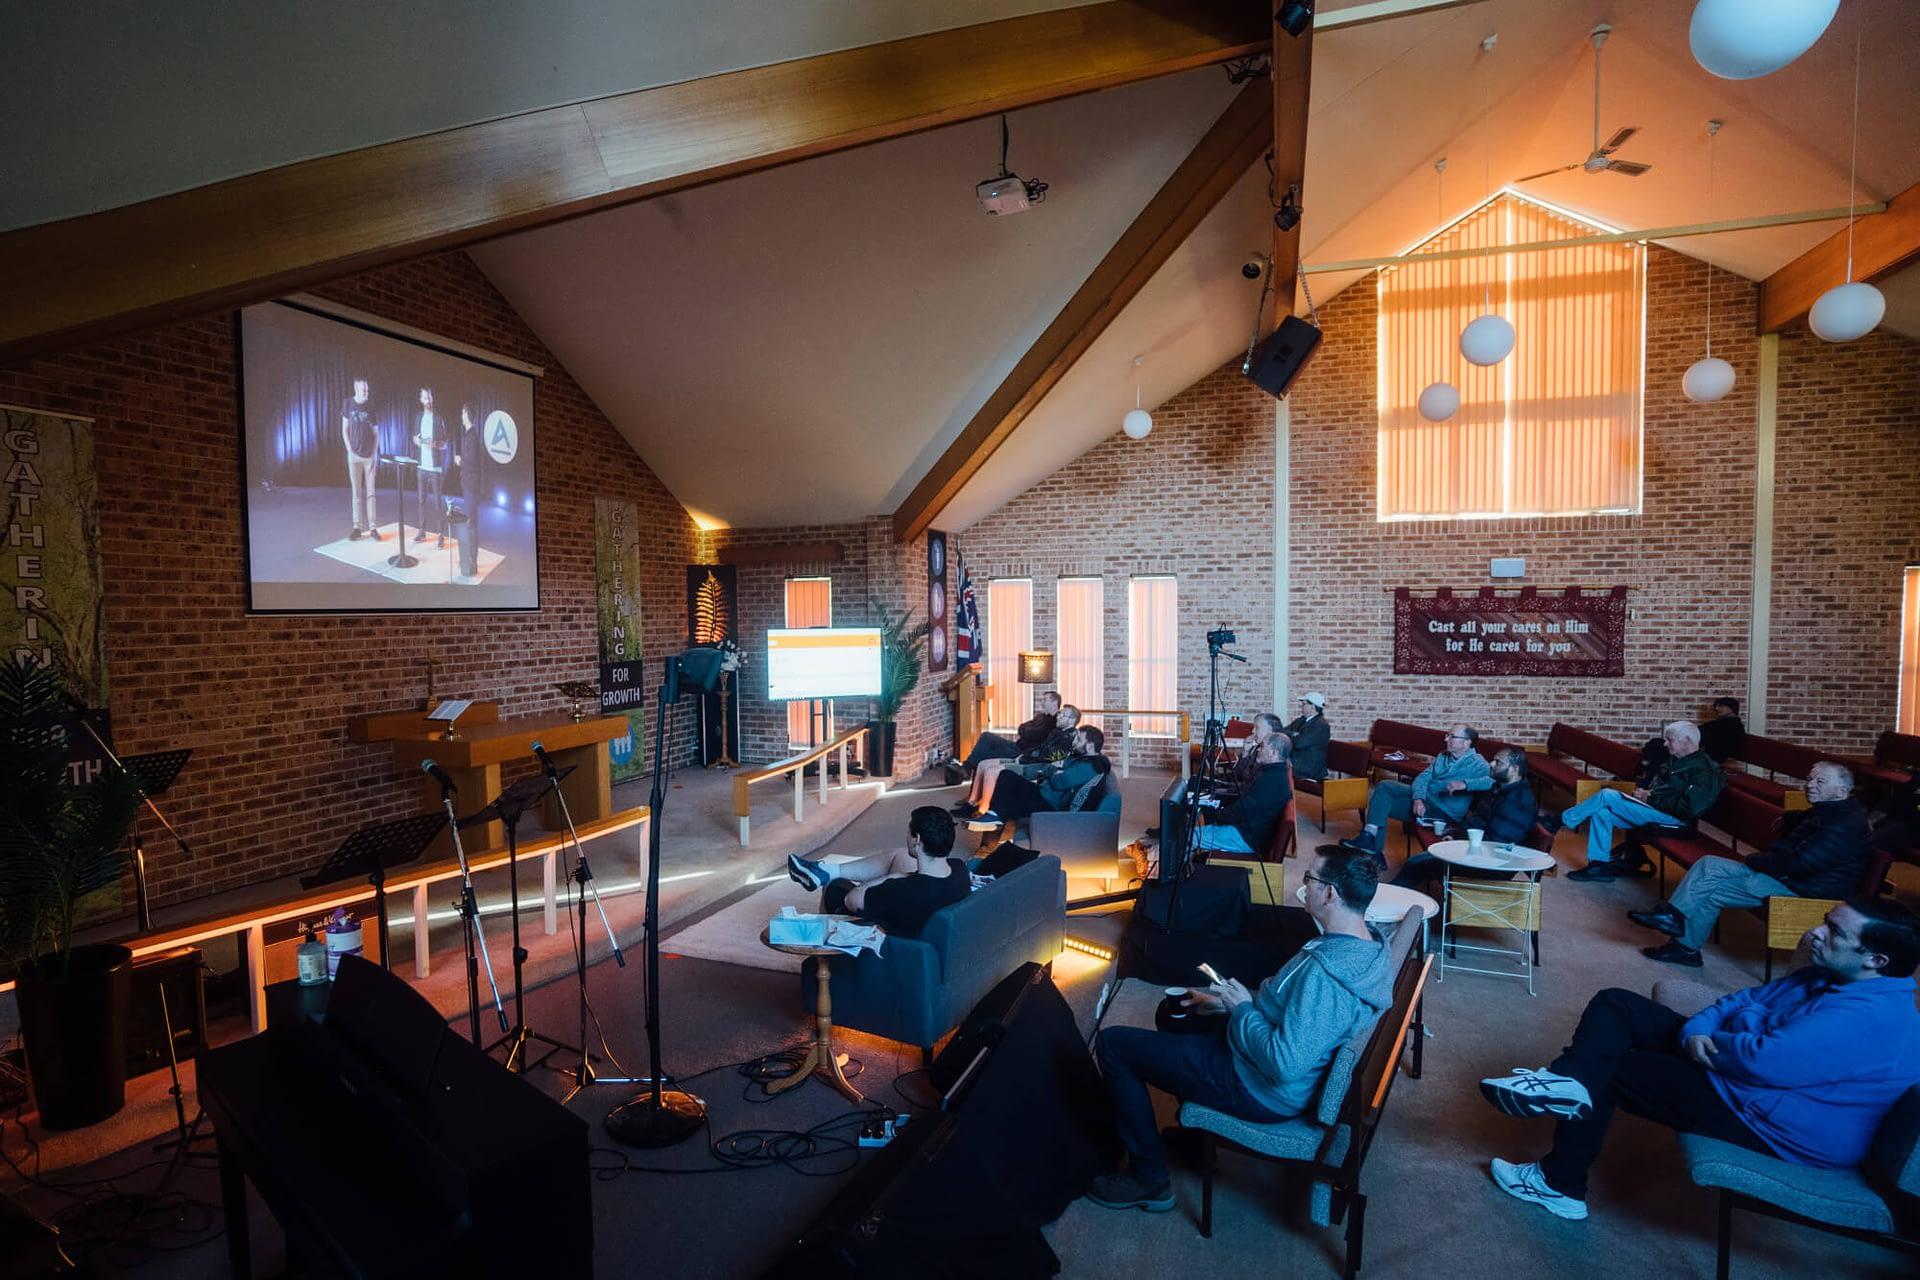 basecamp-2020-livestream-wentworth-falls-gathering-2.jpg